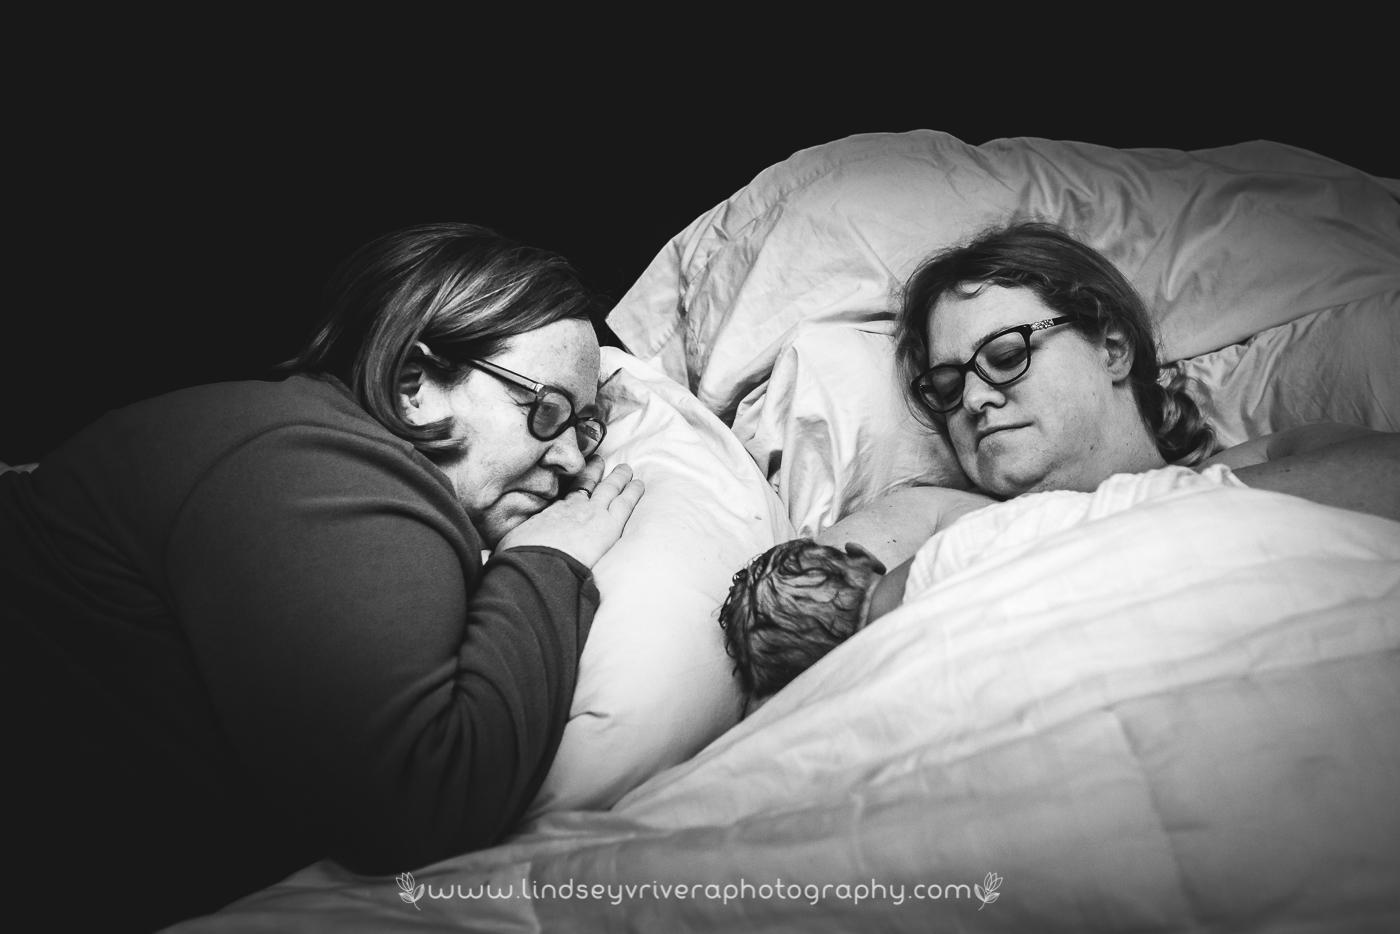 Home-Birth-Born-Photography-Salt-Lake-City,-Wasatch-Midwifery-&-Wellness,-Just-Born48.jpg